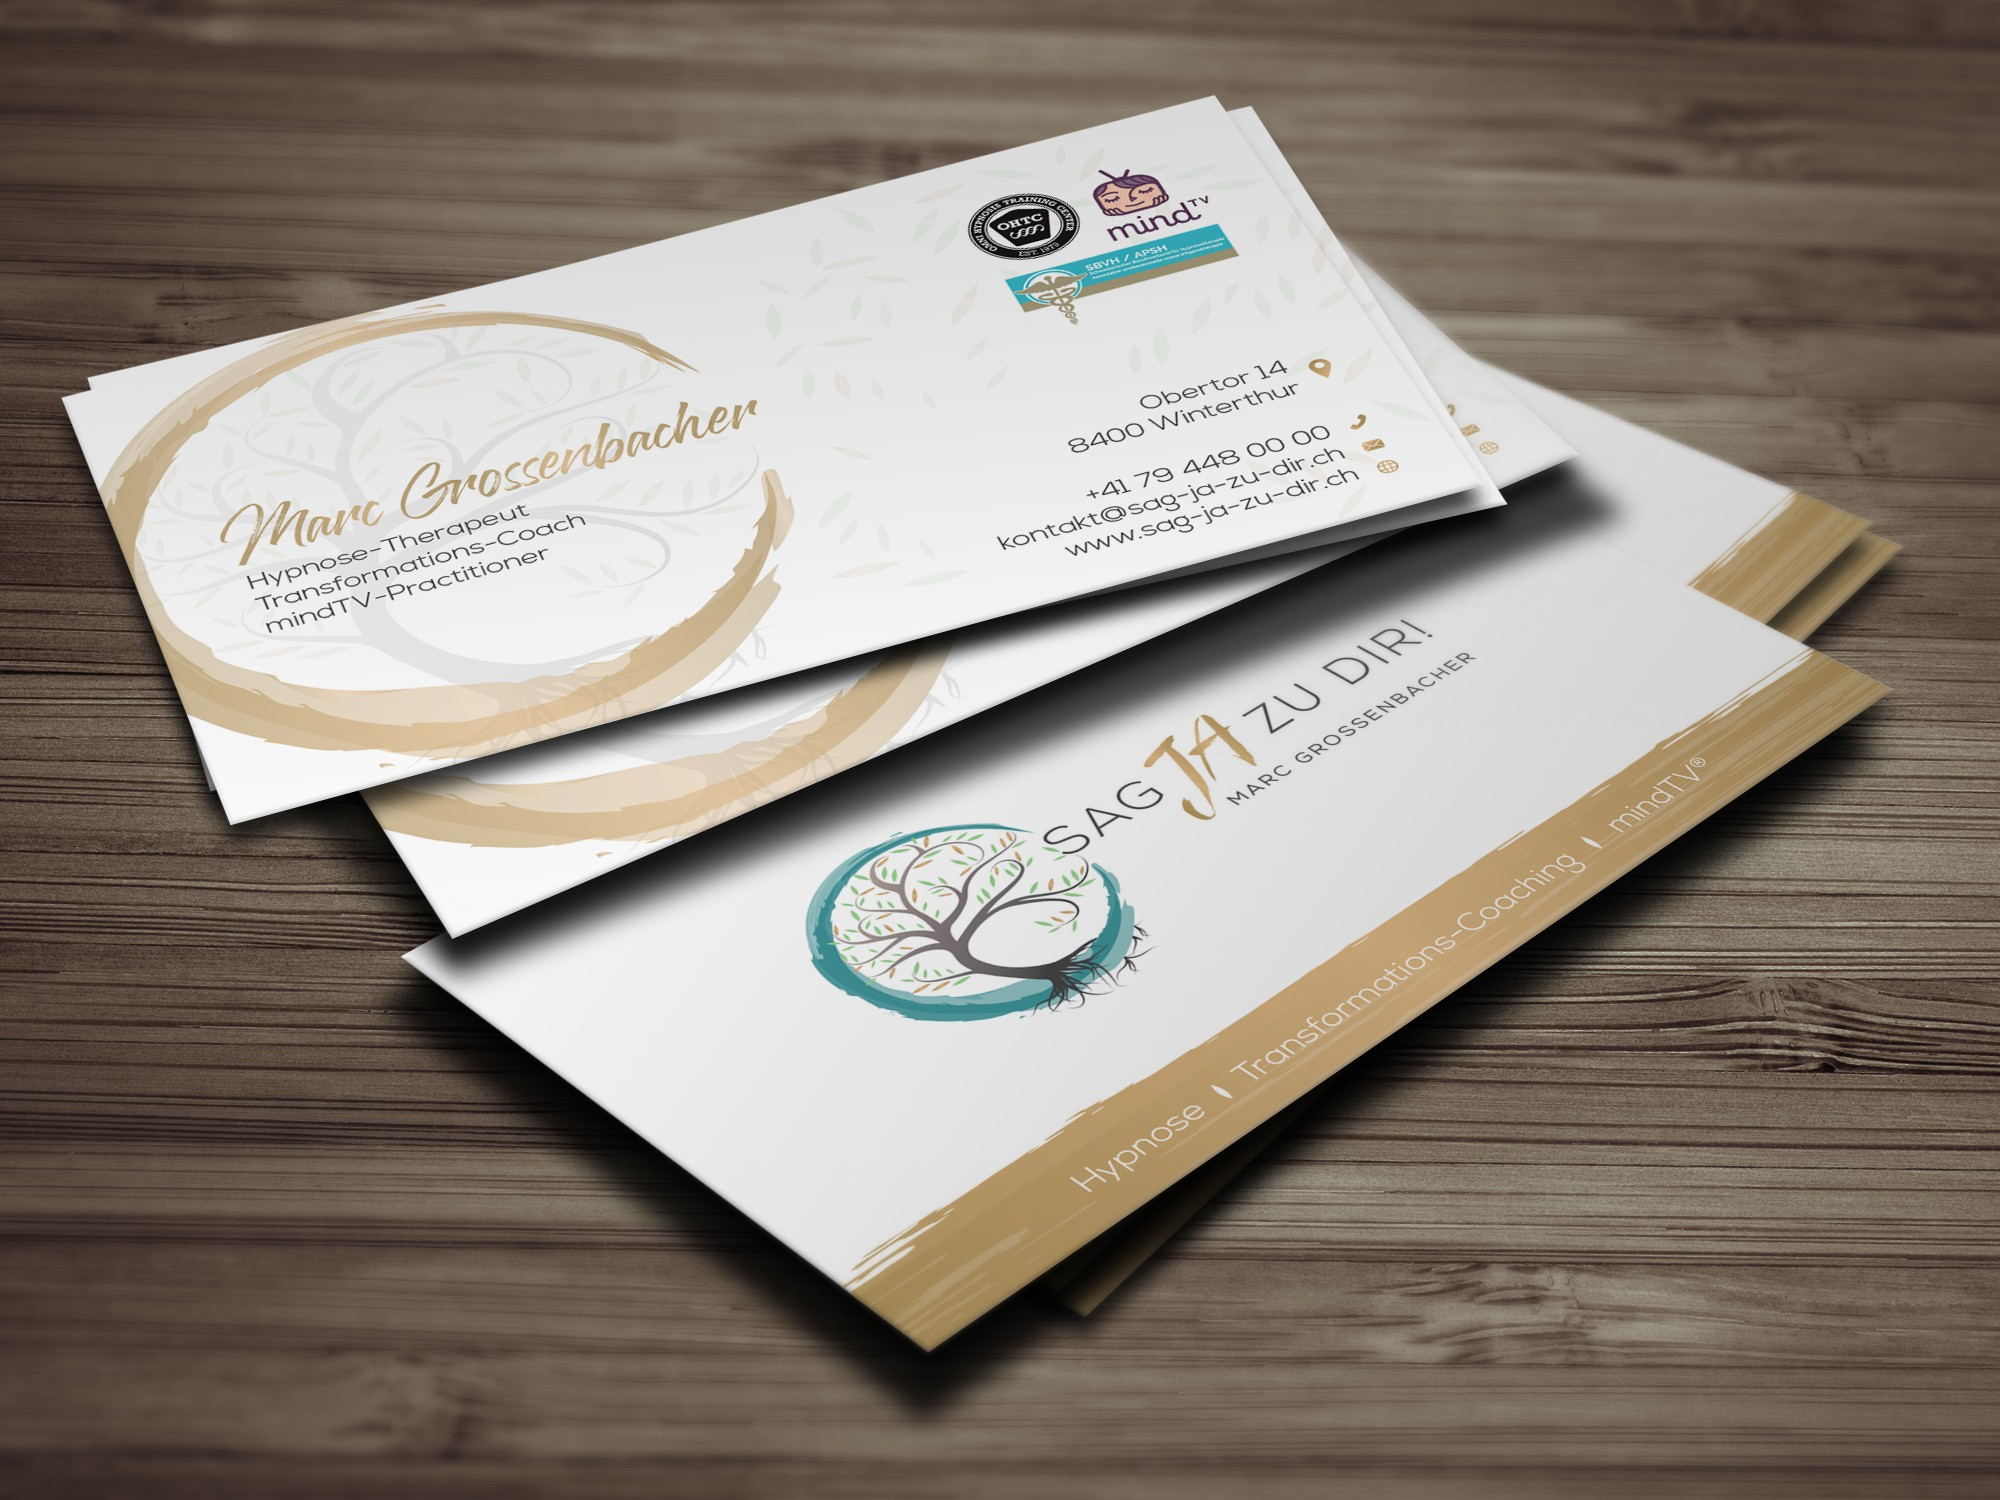 Stylish, harmonious business card (personality development in the higher price segment)